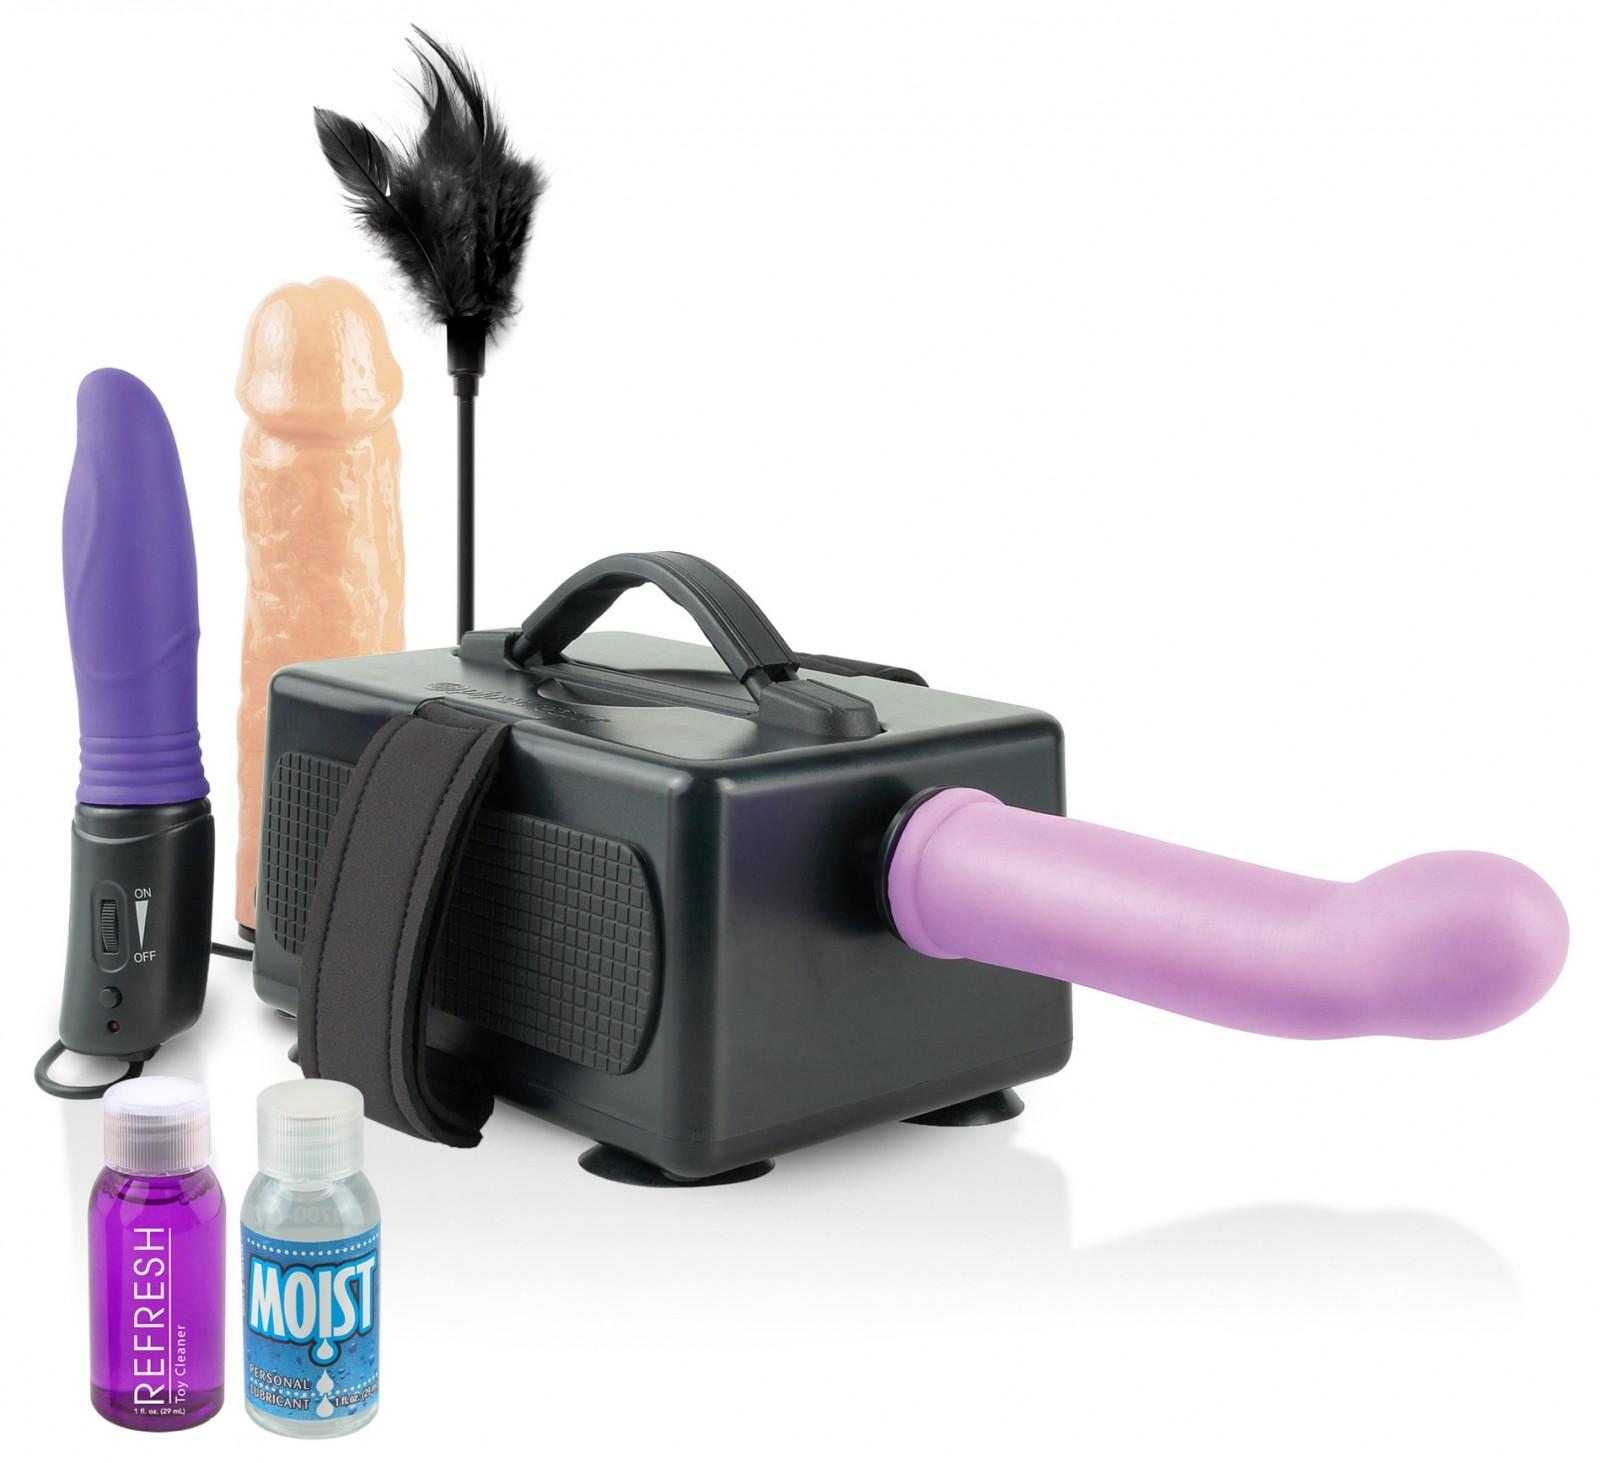 Šukací stroj Portable Sex Machine - Fetish Fantasy